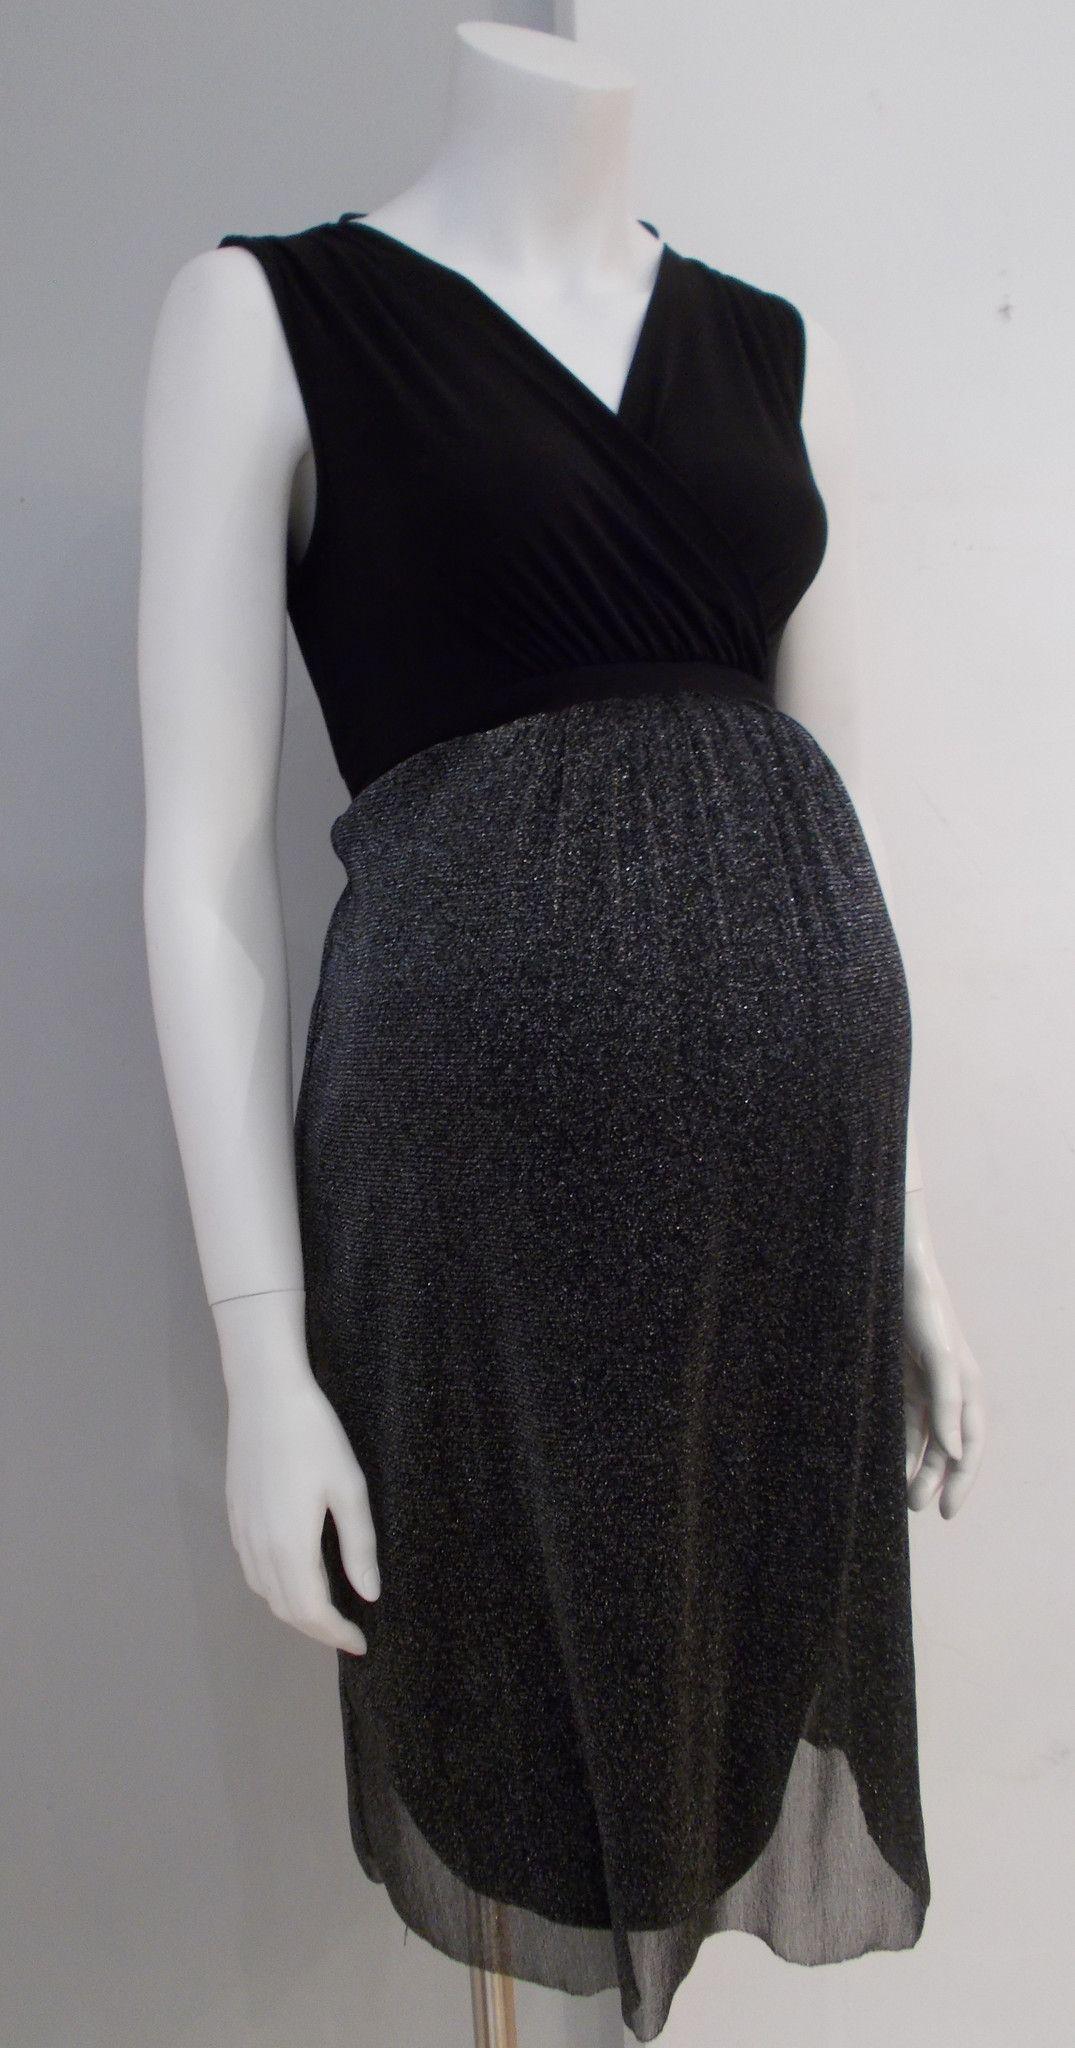 65b66ee18e7 Thyme Maternity - Sleeveless Evening Dress with Shimmer Bottom ...